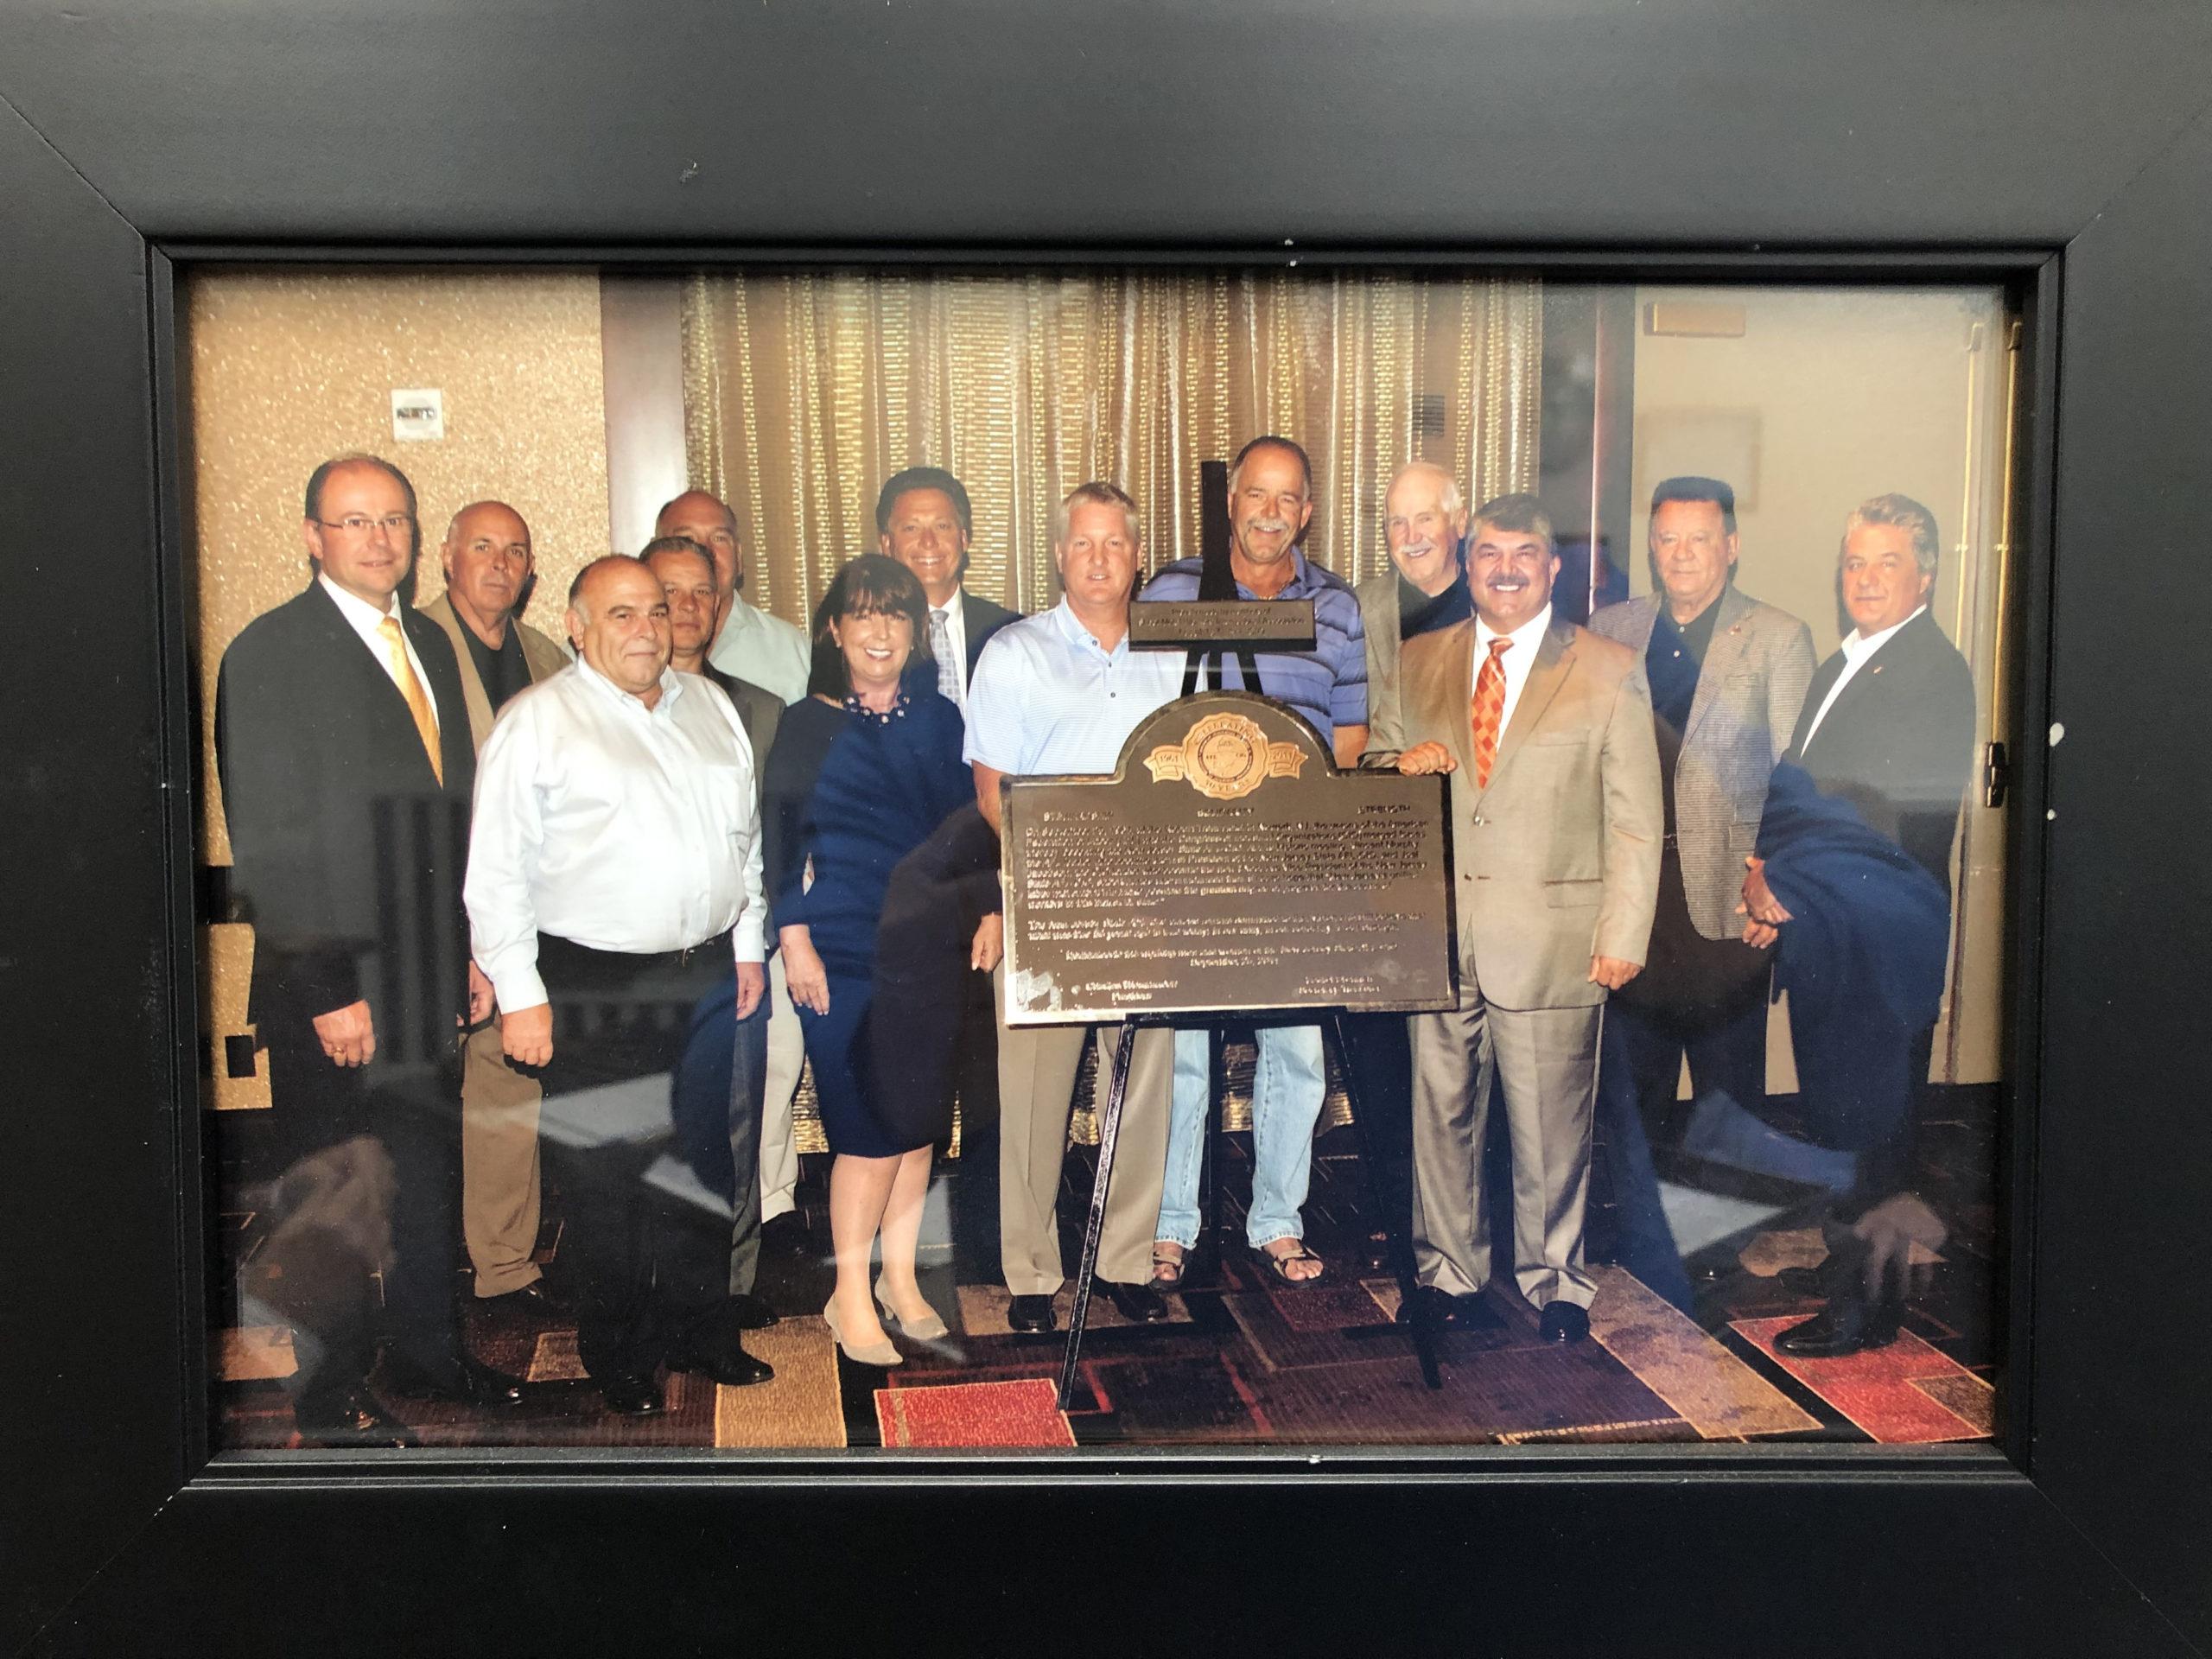 Sheetmetal Workers Local 25 Celebrates the Life of Richard Trumka